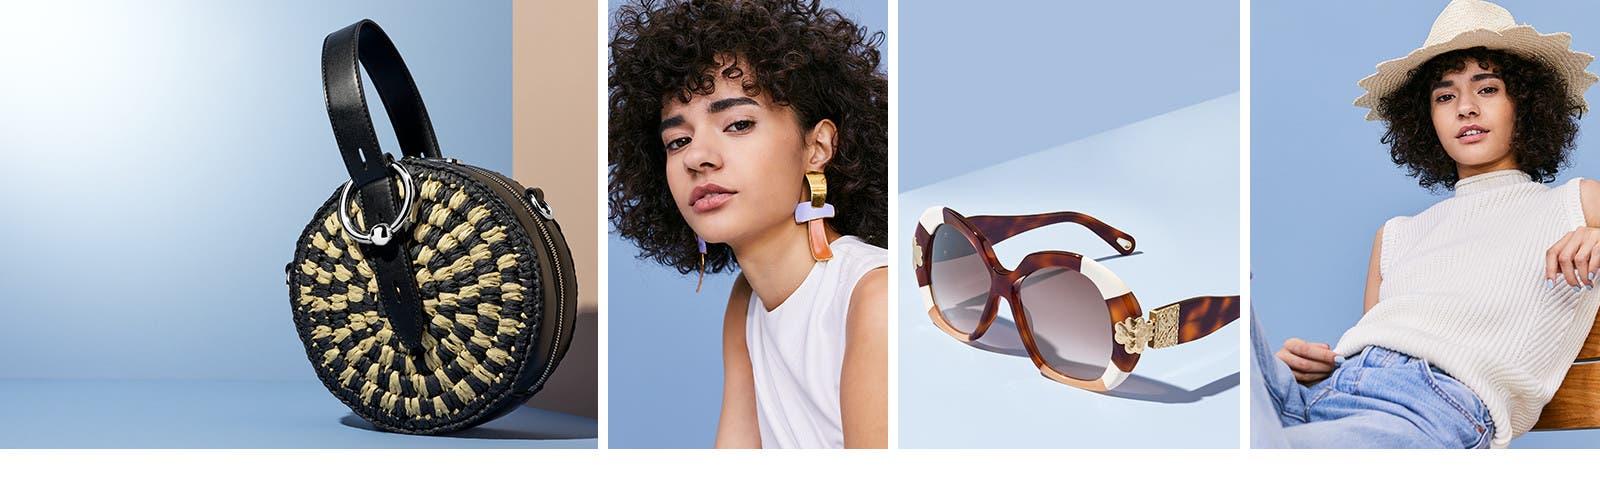 New women's accessories.